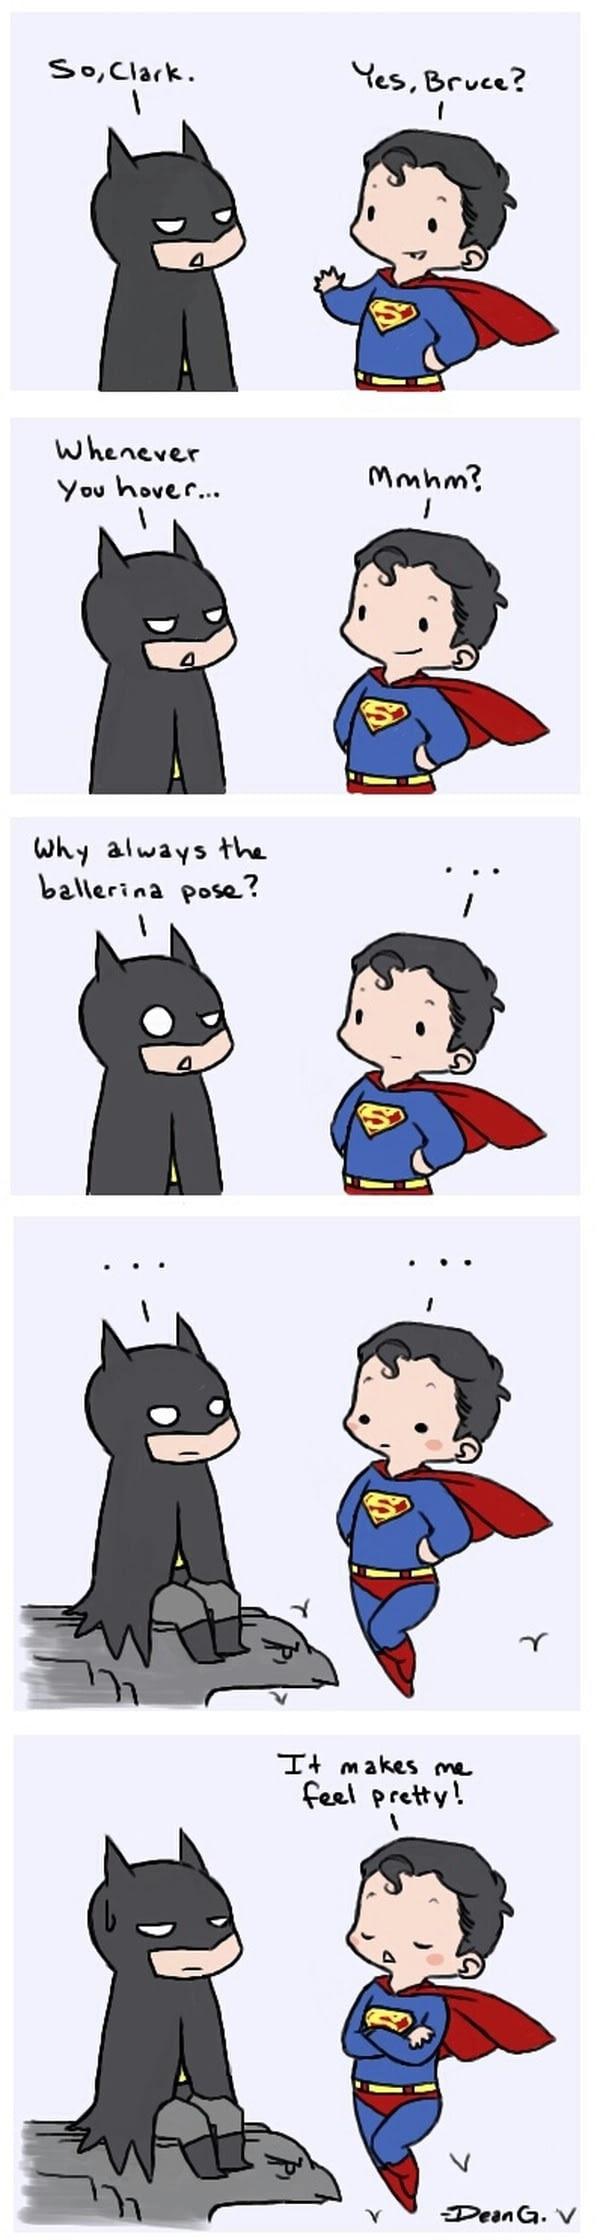 Superman clipart yes you Superman feels 9GAG feels pretty